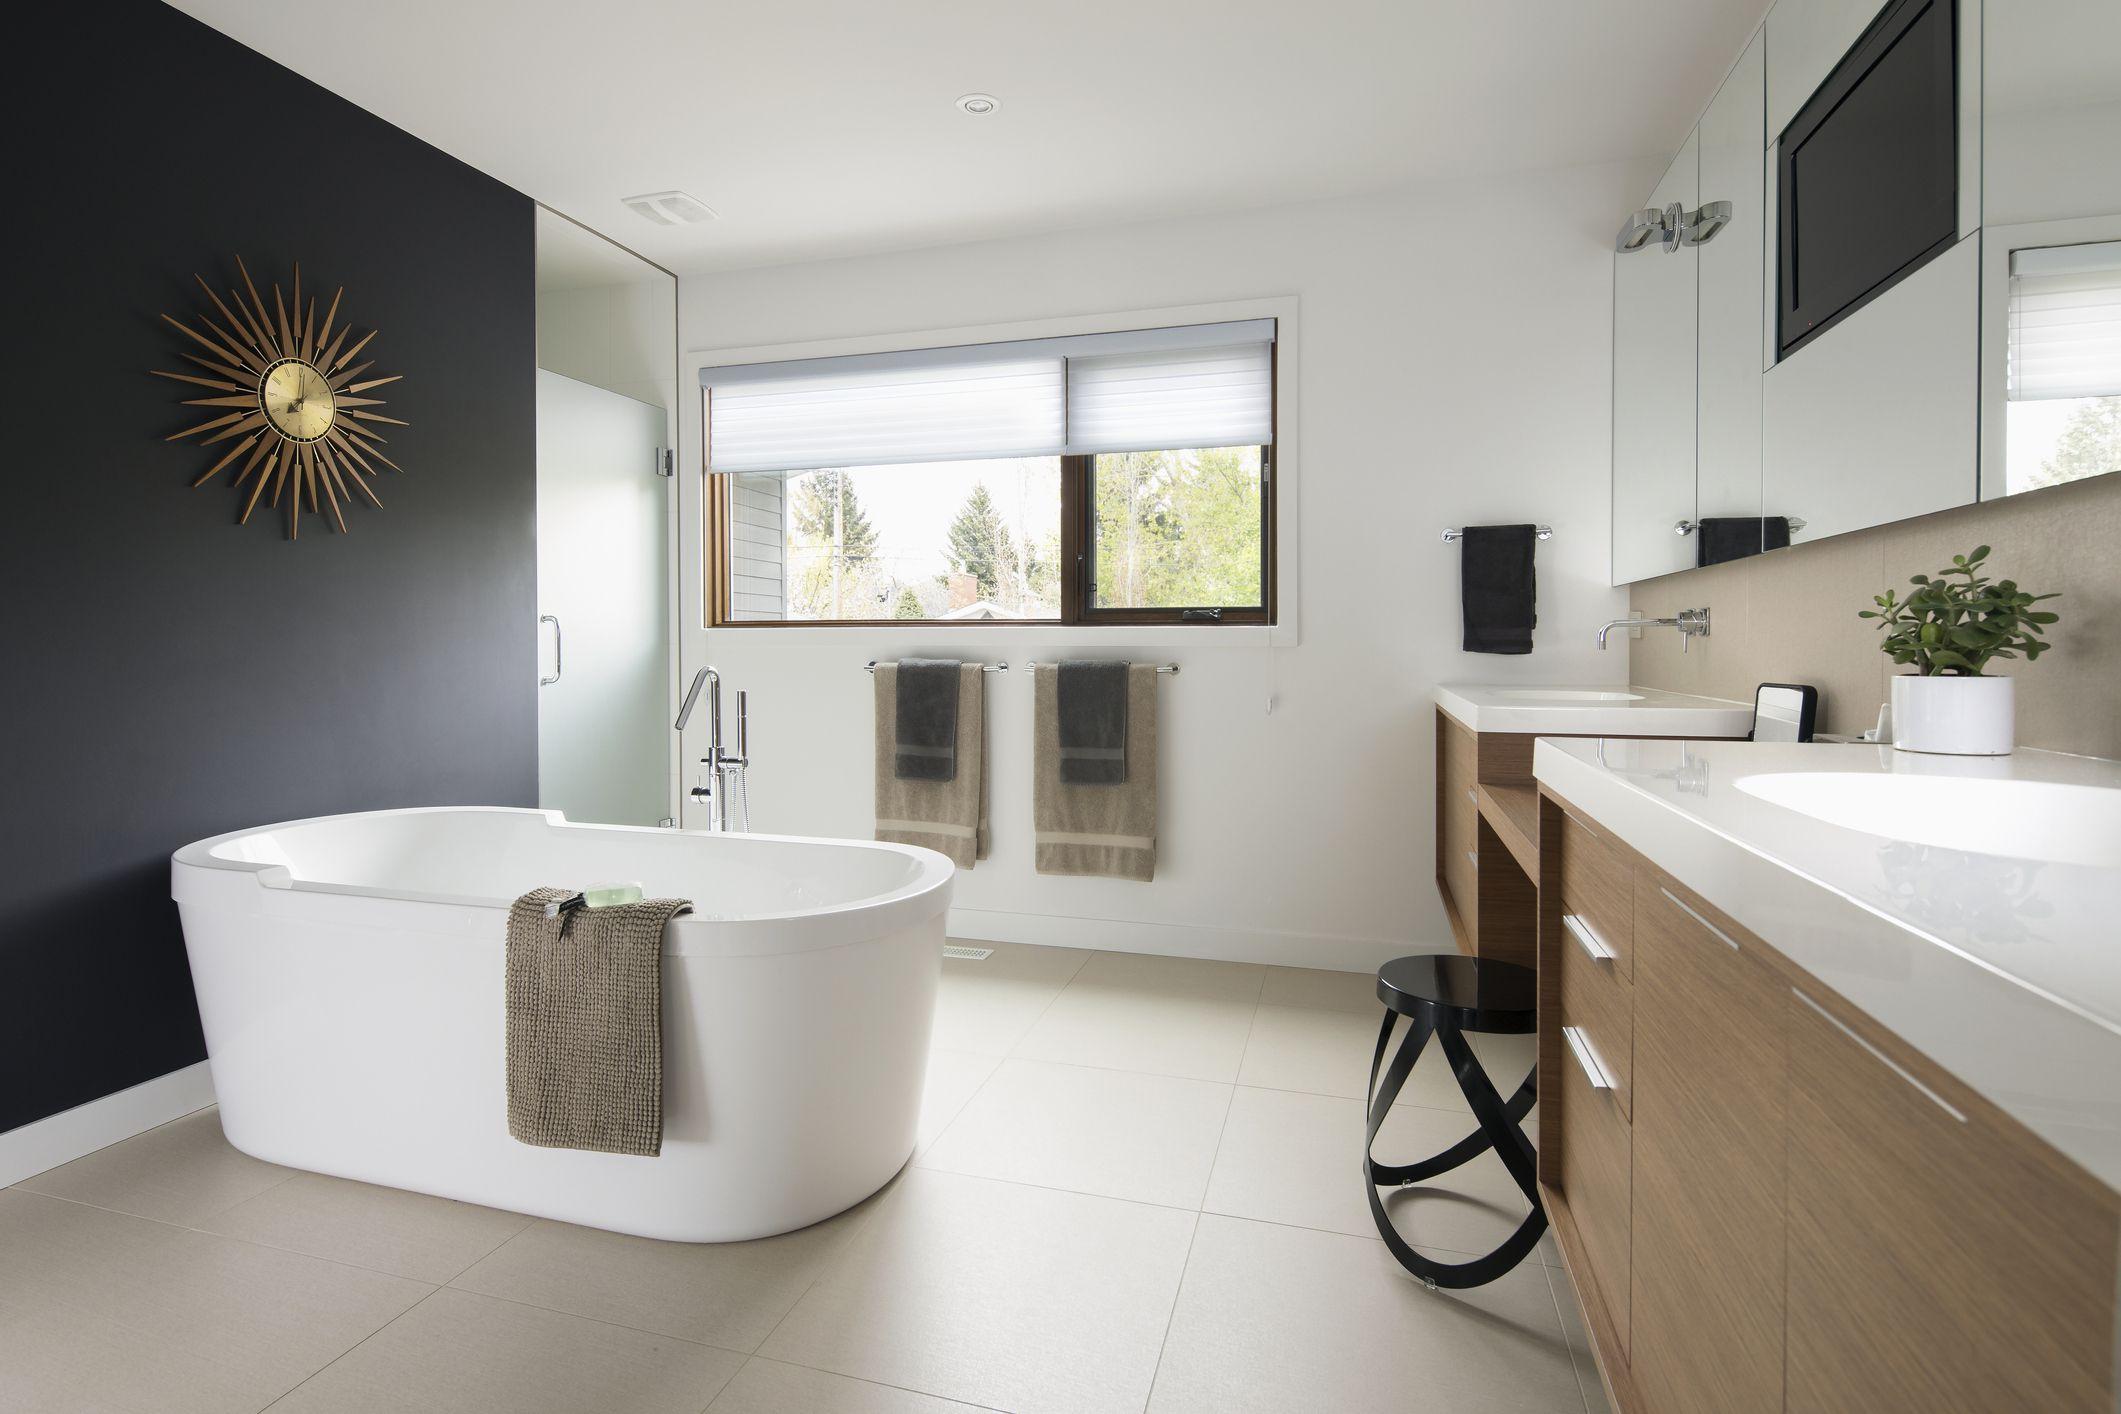 14 Ideas for Modern-Style Bathrooms on Bathroom Ideas Photo Gallery  id=98662